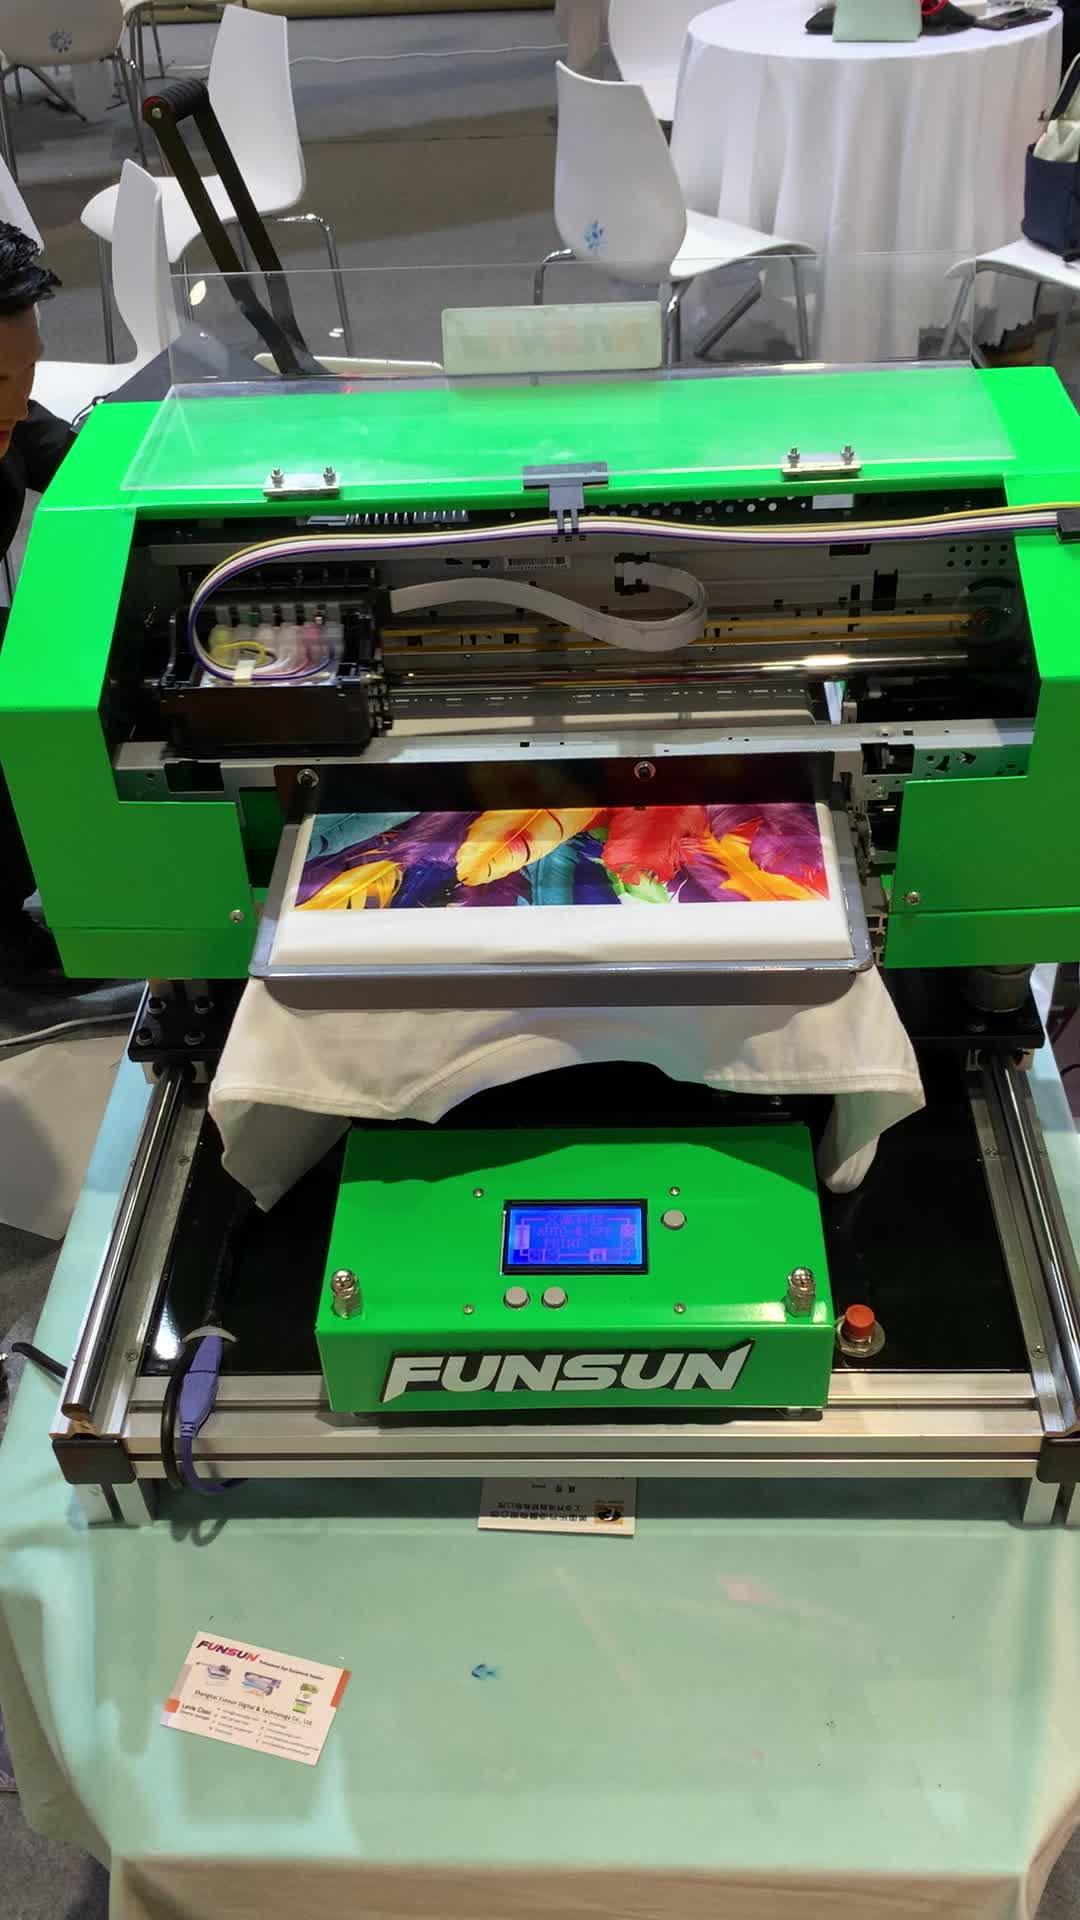 DTG uv printer for t shirt digital t-shirt printing machine